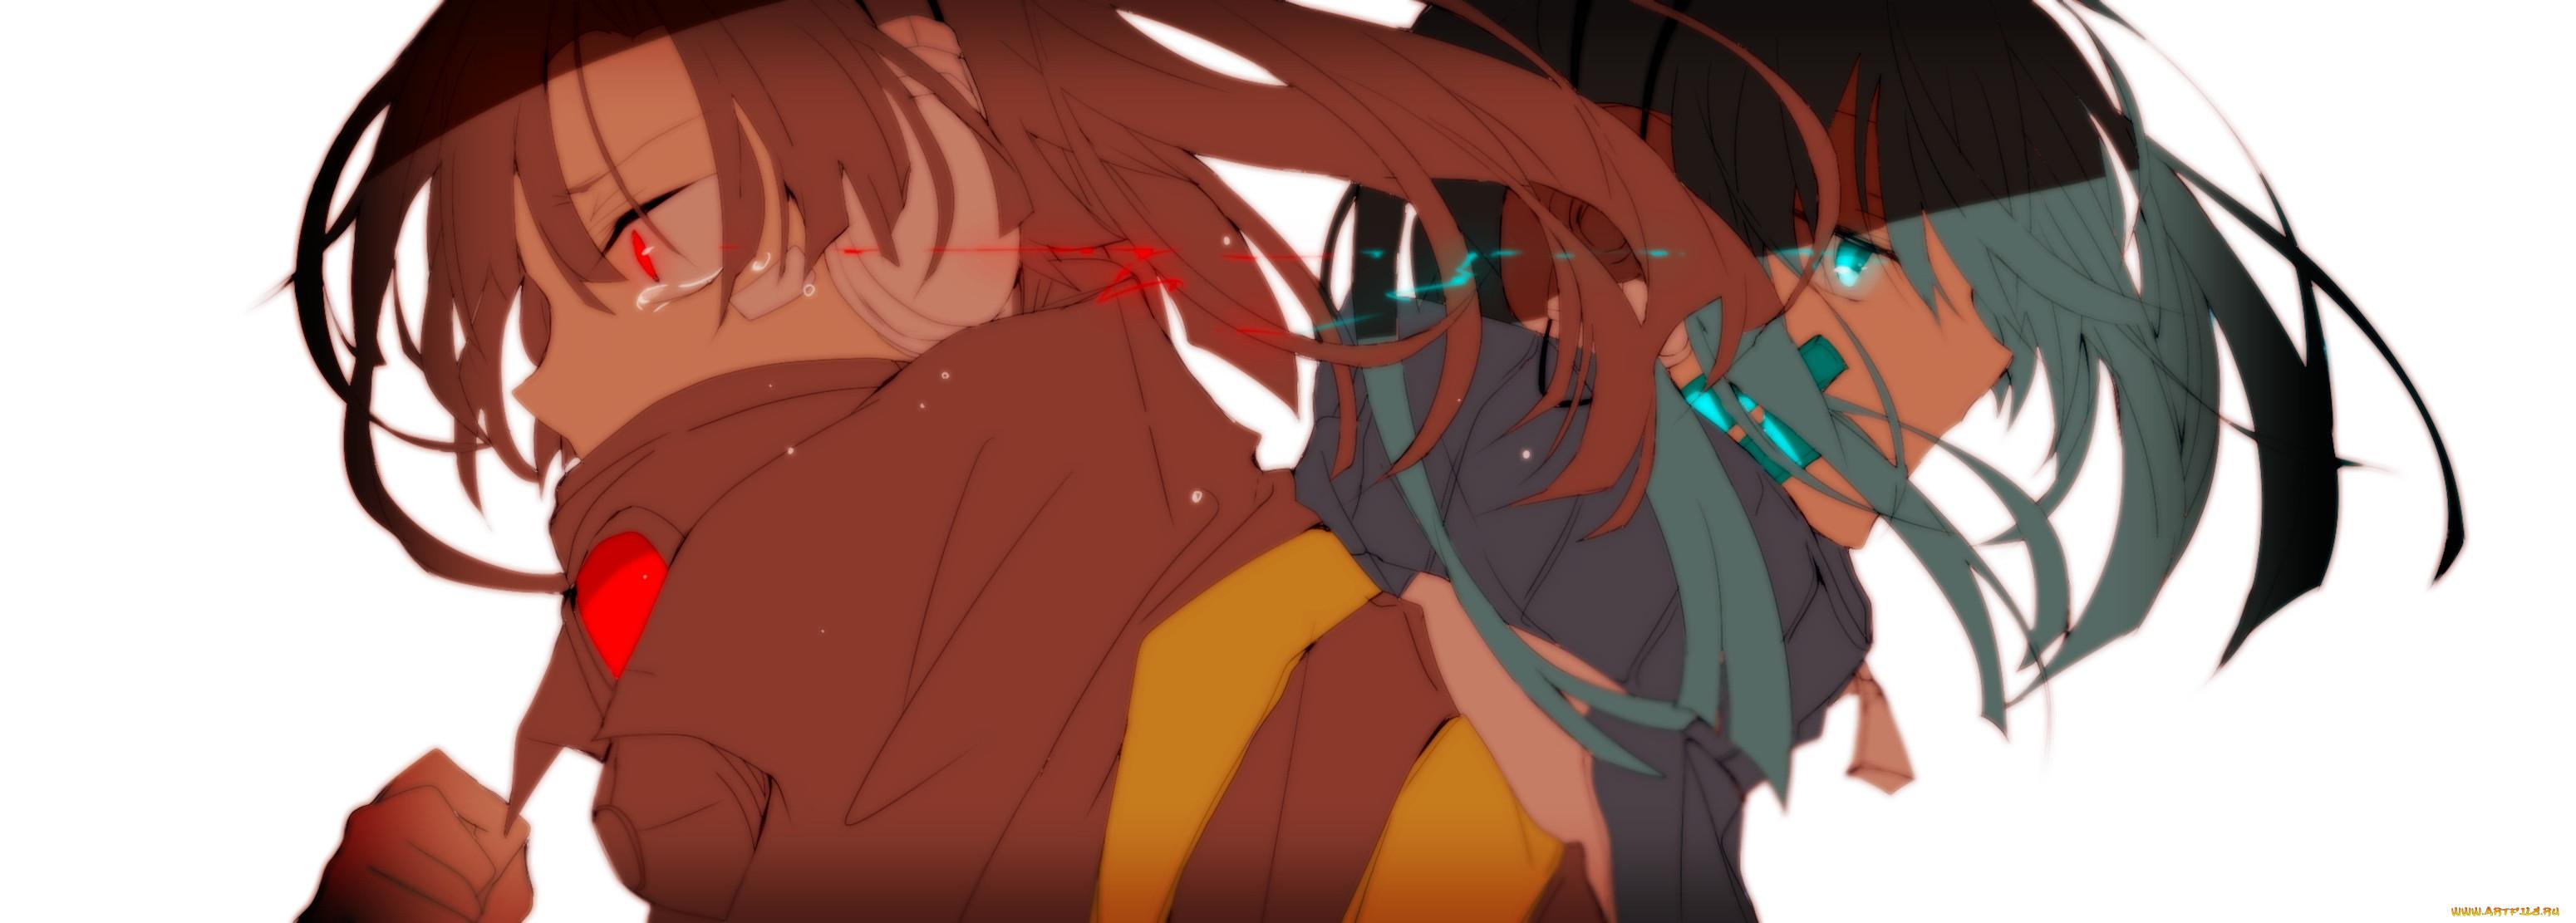 аниме, kagerou project, enomoto, takane, ene, kagerou, project, слёзы, арт, misoan